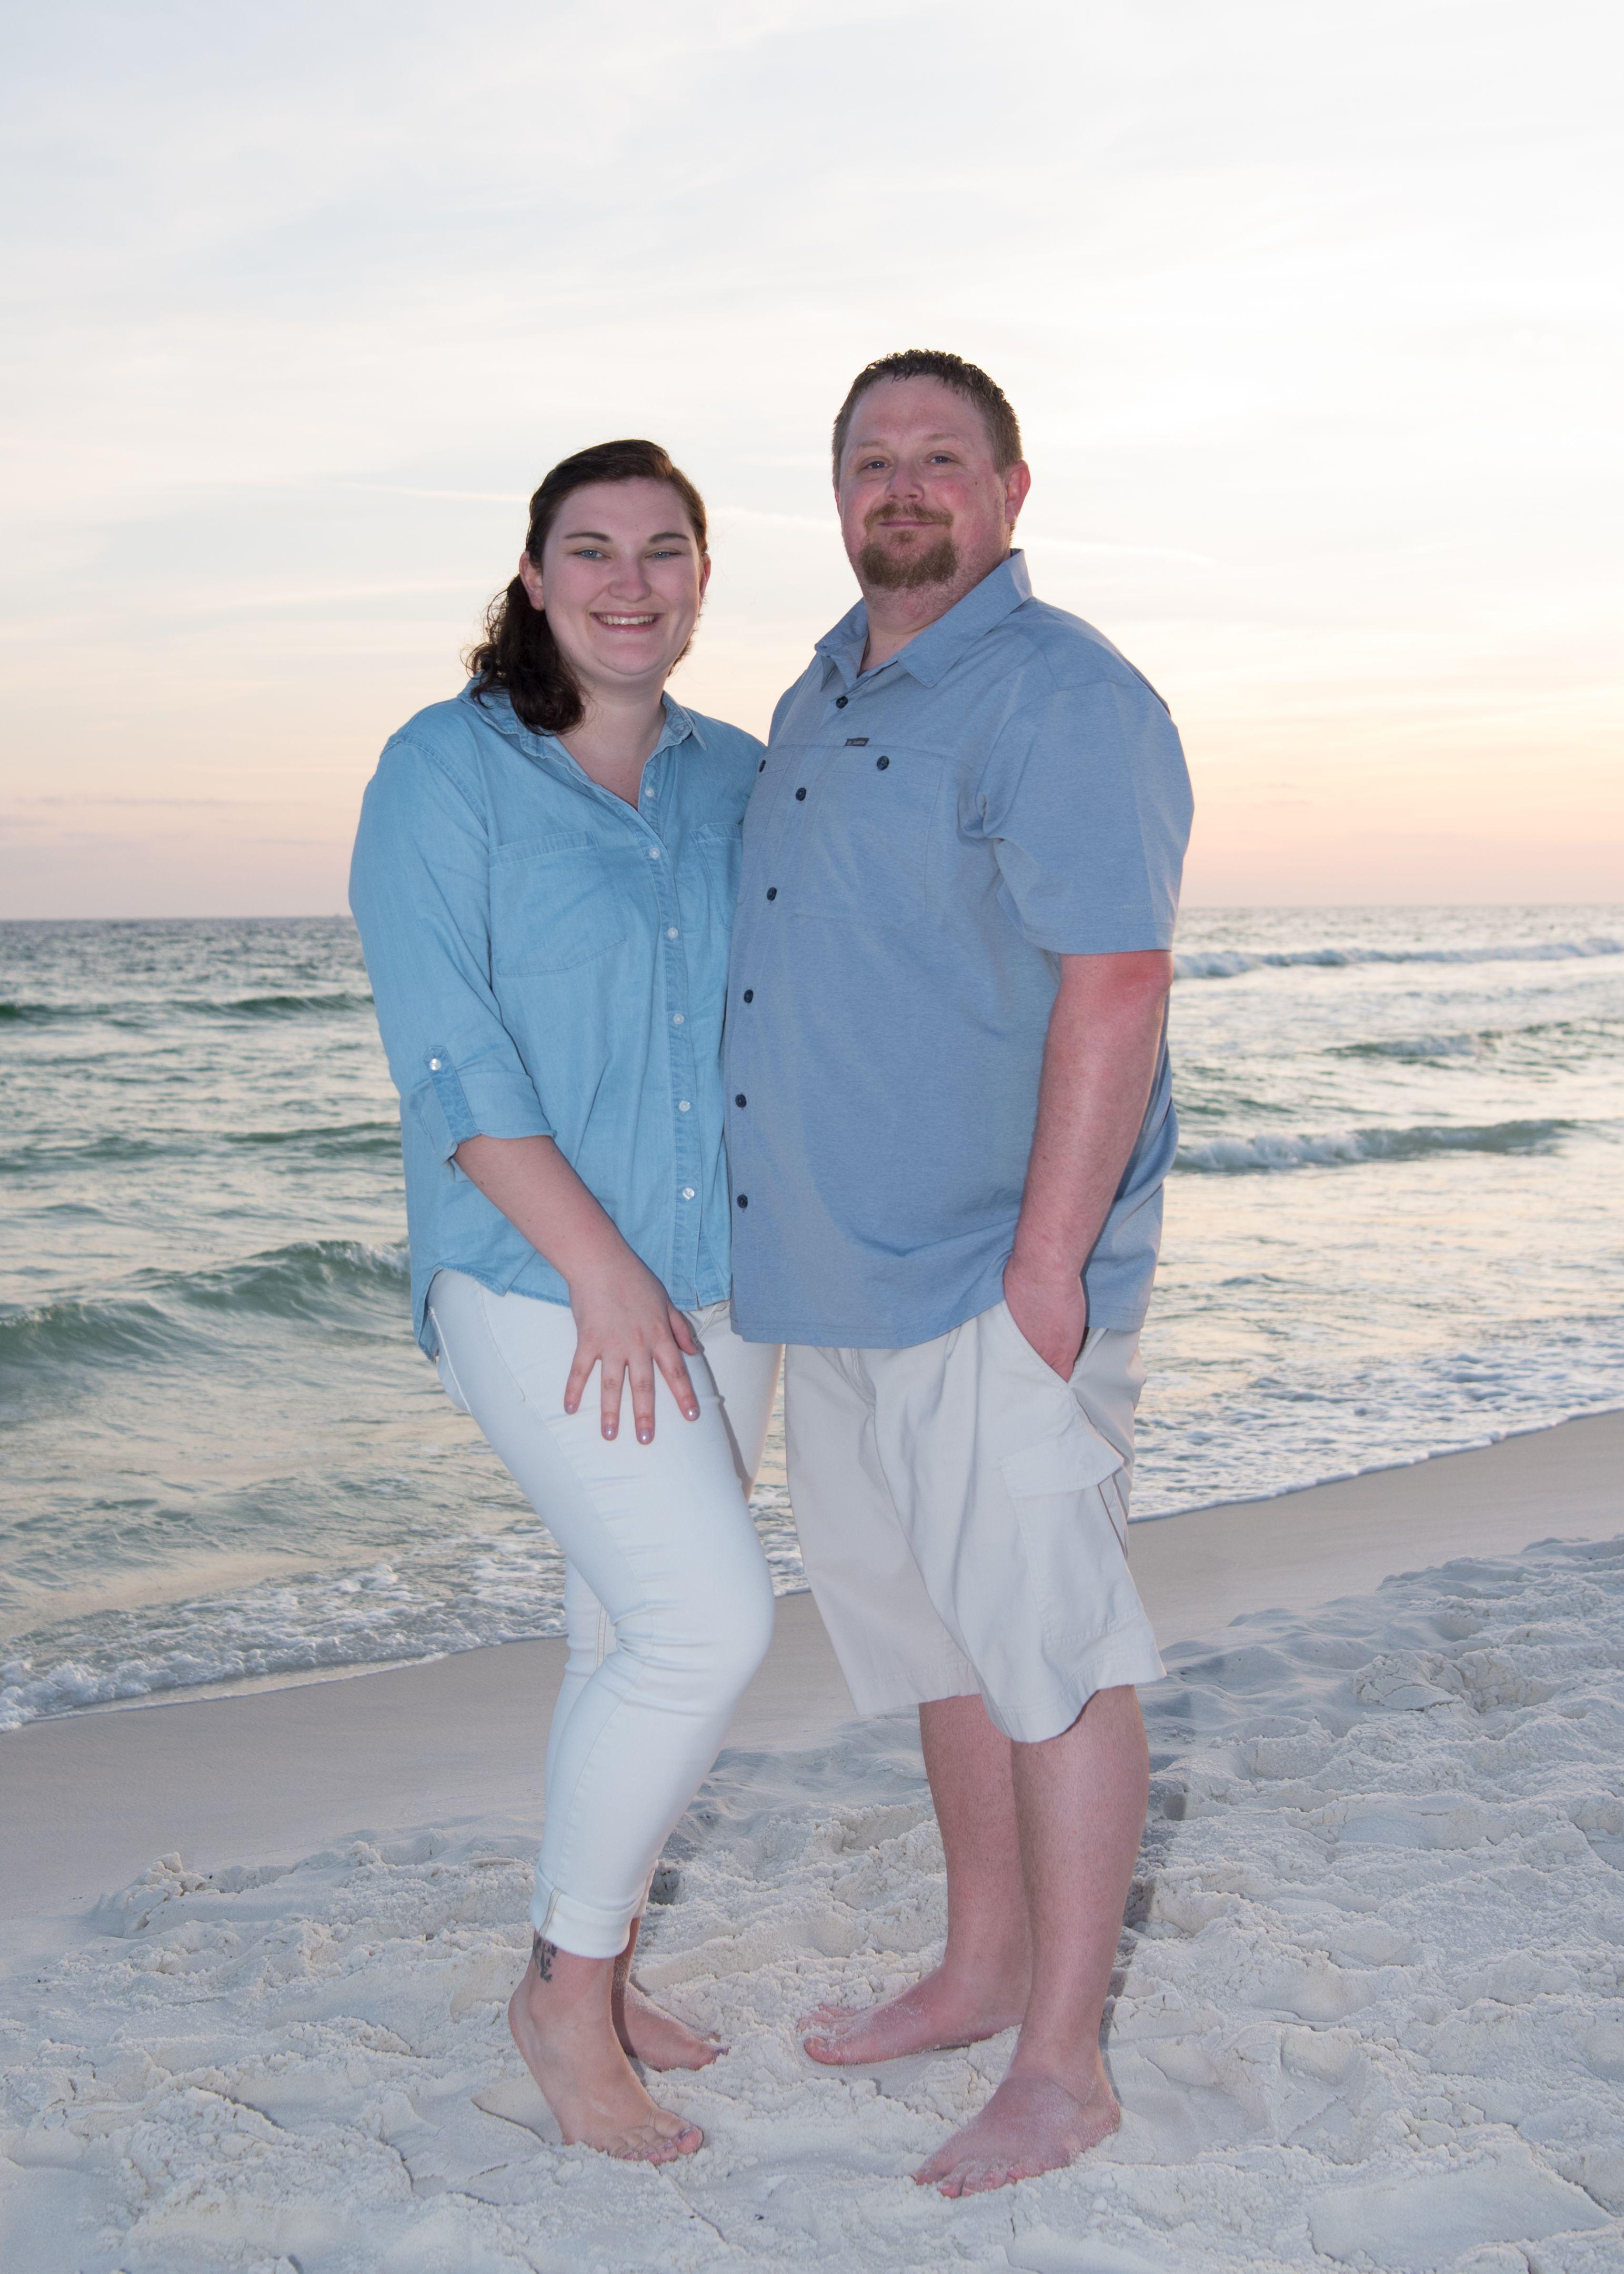 Pin On Beach Portraits